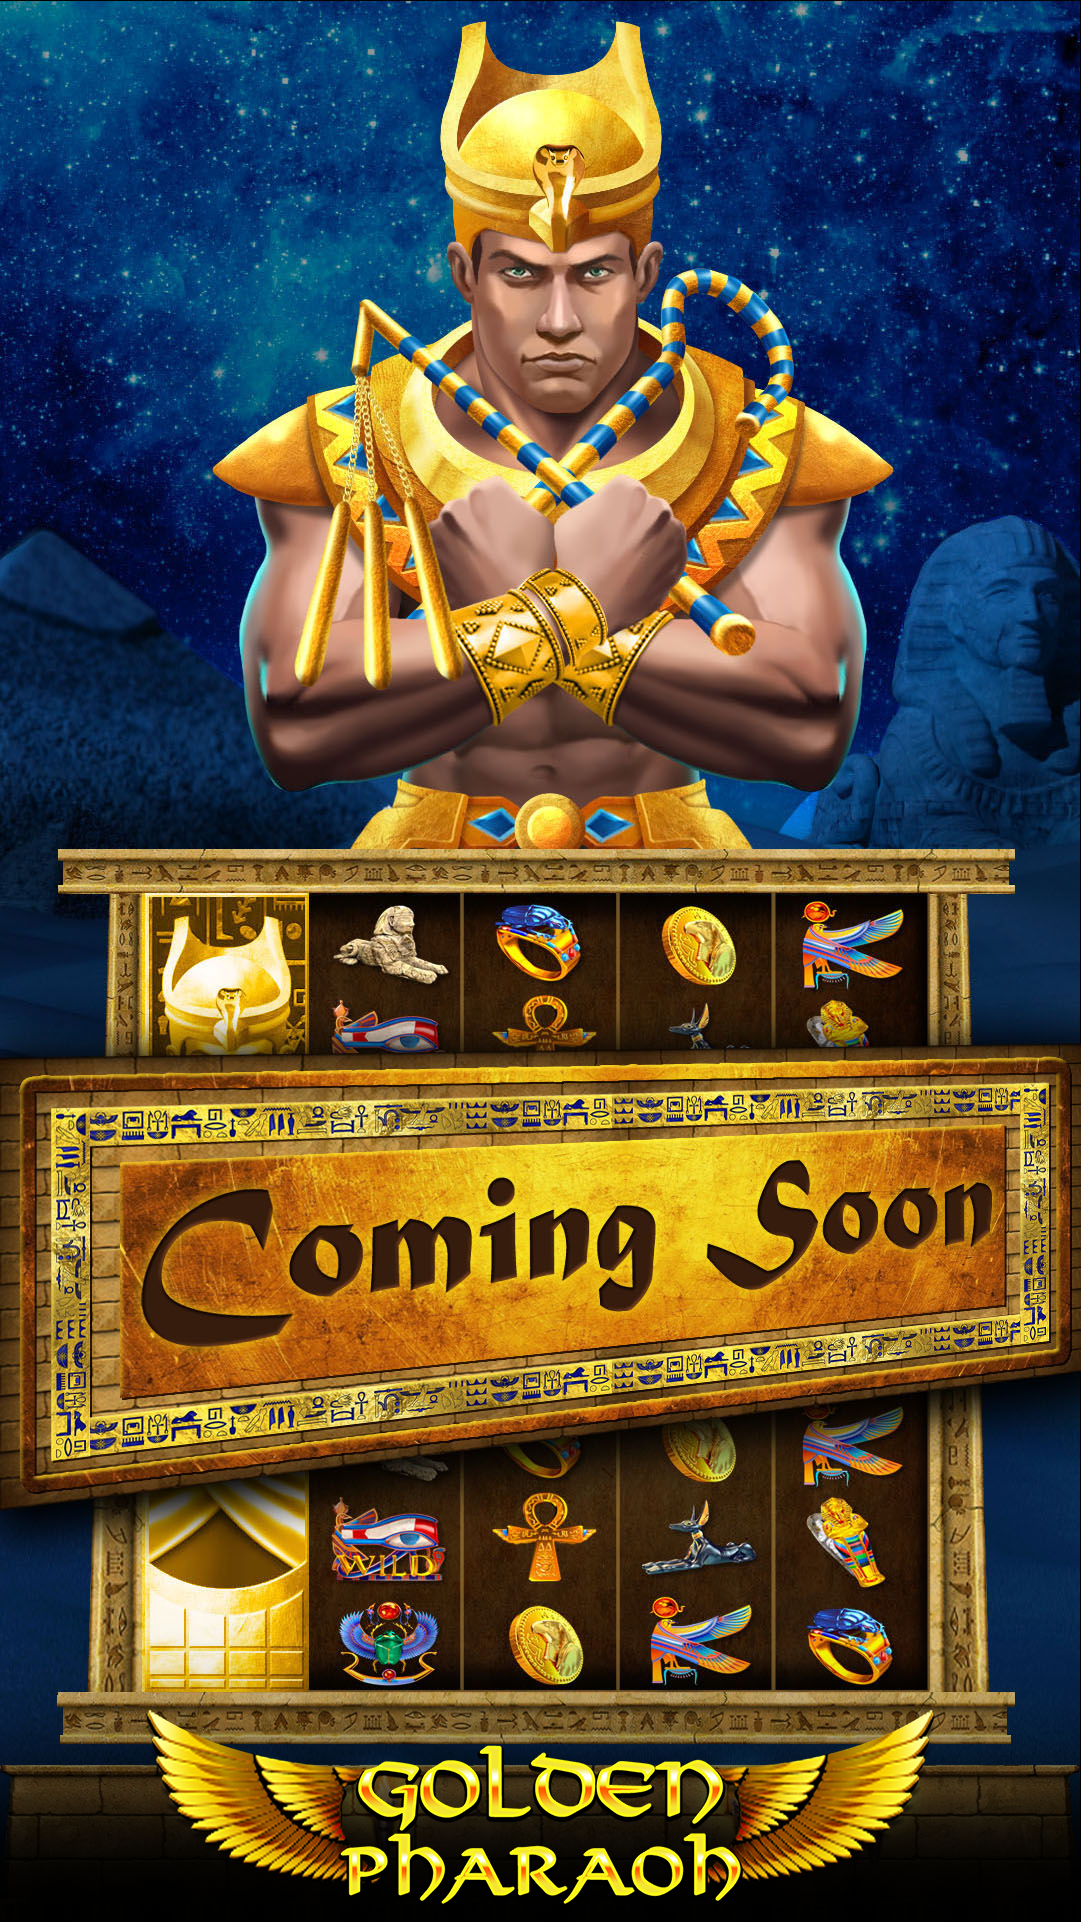 Golden-Pharaoh-Vertical-pull-tab-game-Hero-Screen